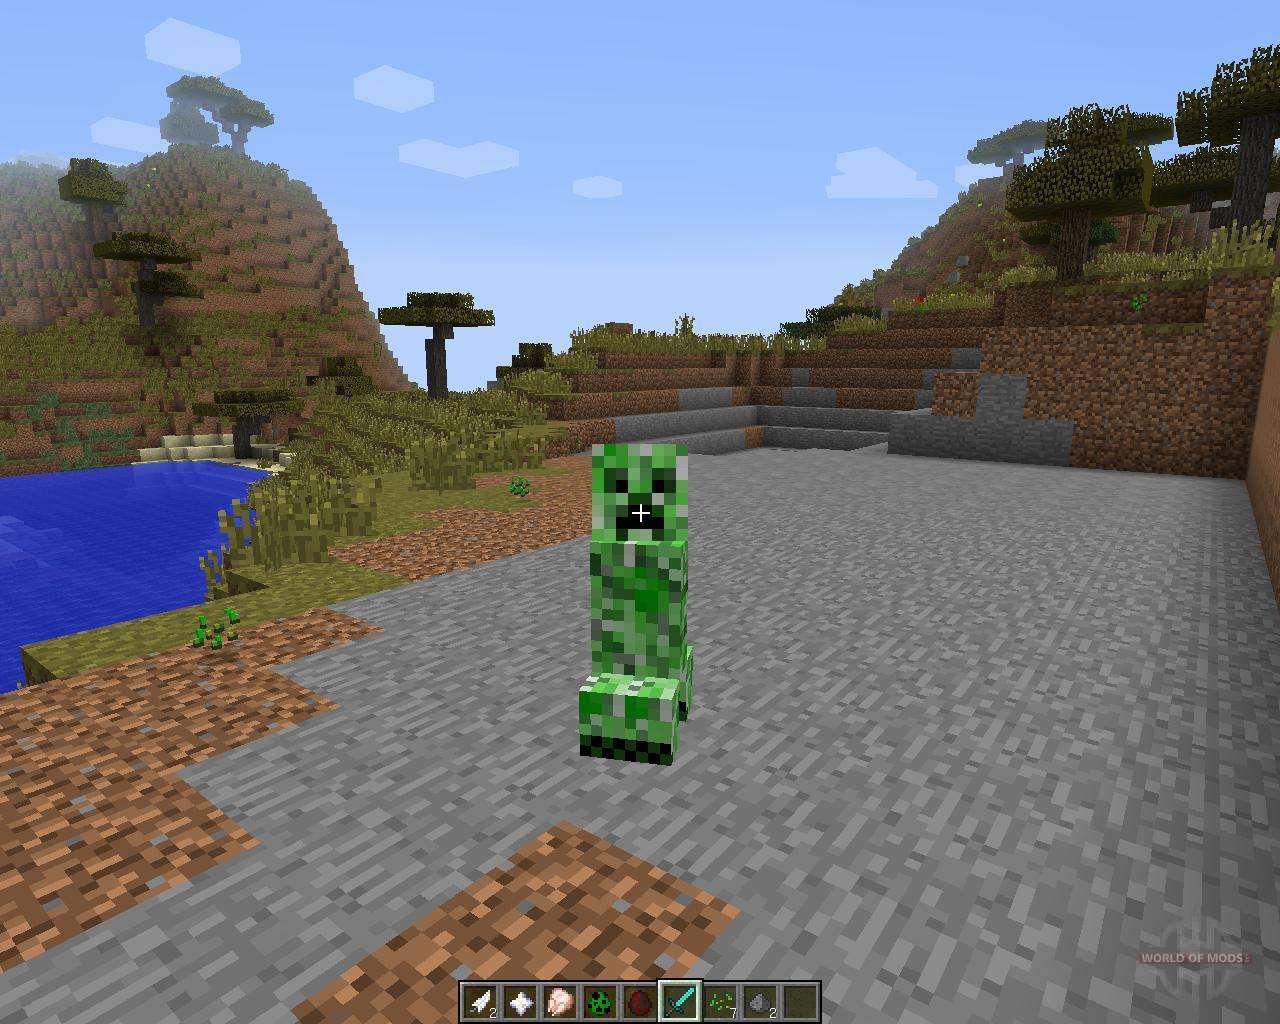 Minecraft 1.7.2 Скачать - tlauncher.org